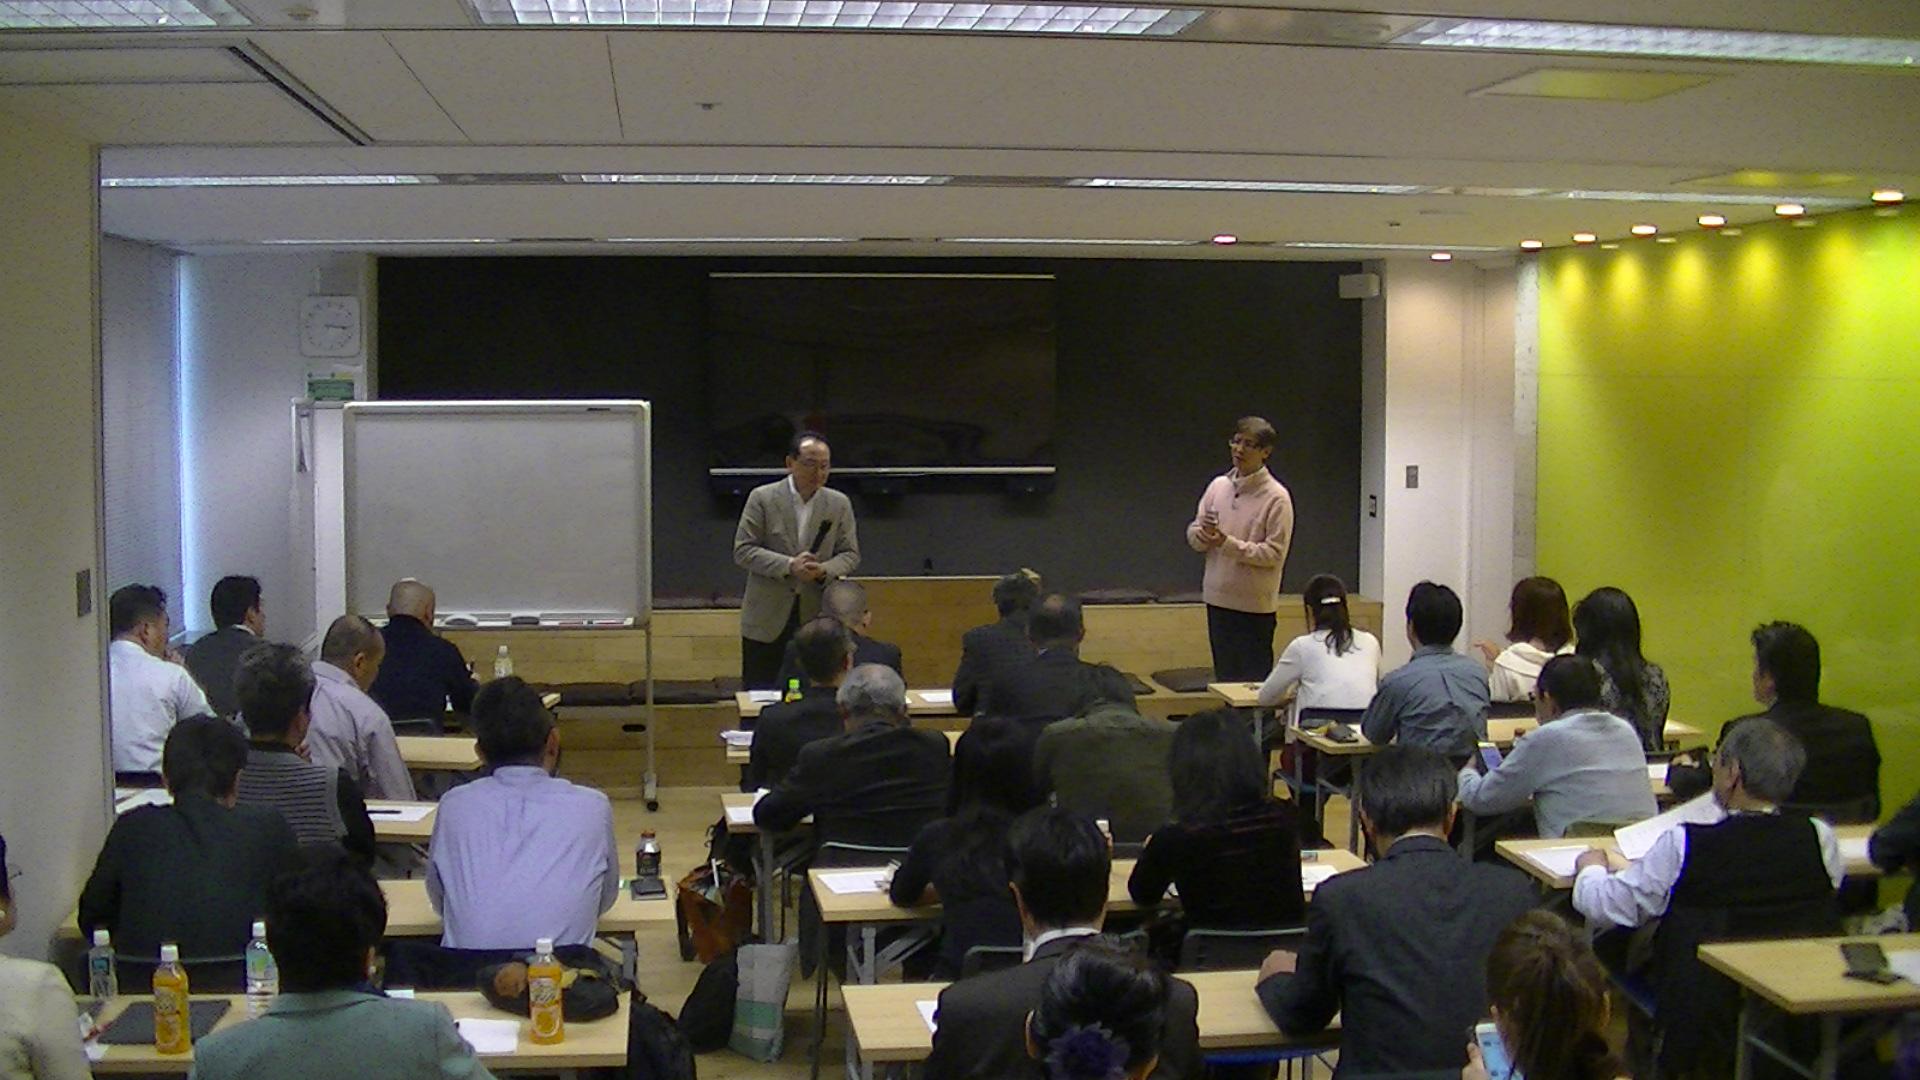 PIC 0698 - 4月1日東京思風塾の開催になります。